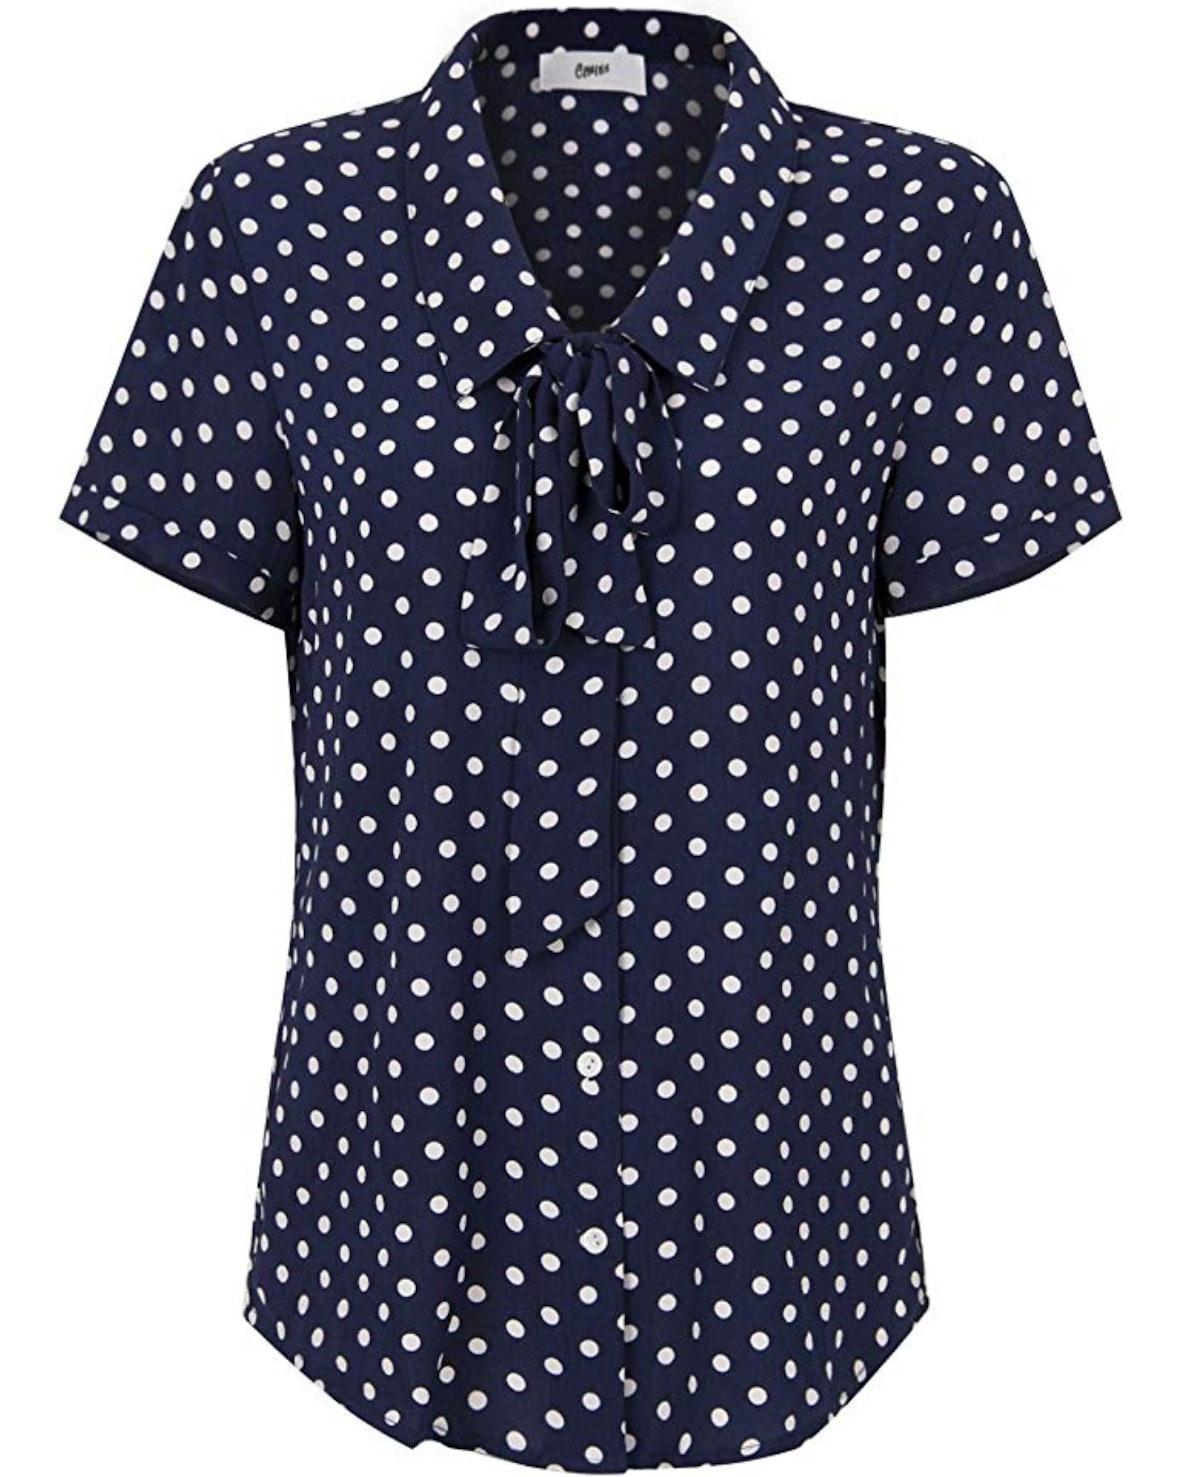 Choies Women Royal Blue Vintage Bow Tie Front Polka Dot Print Short Sleeve Shirt